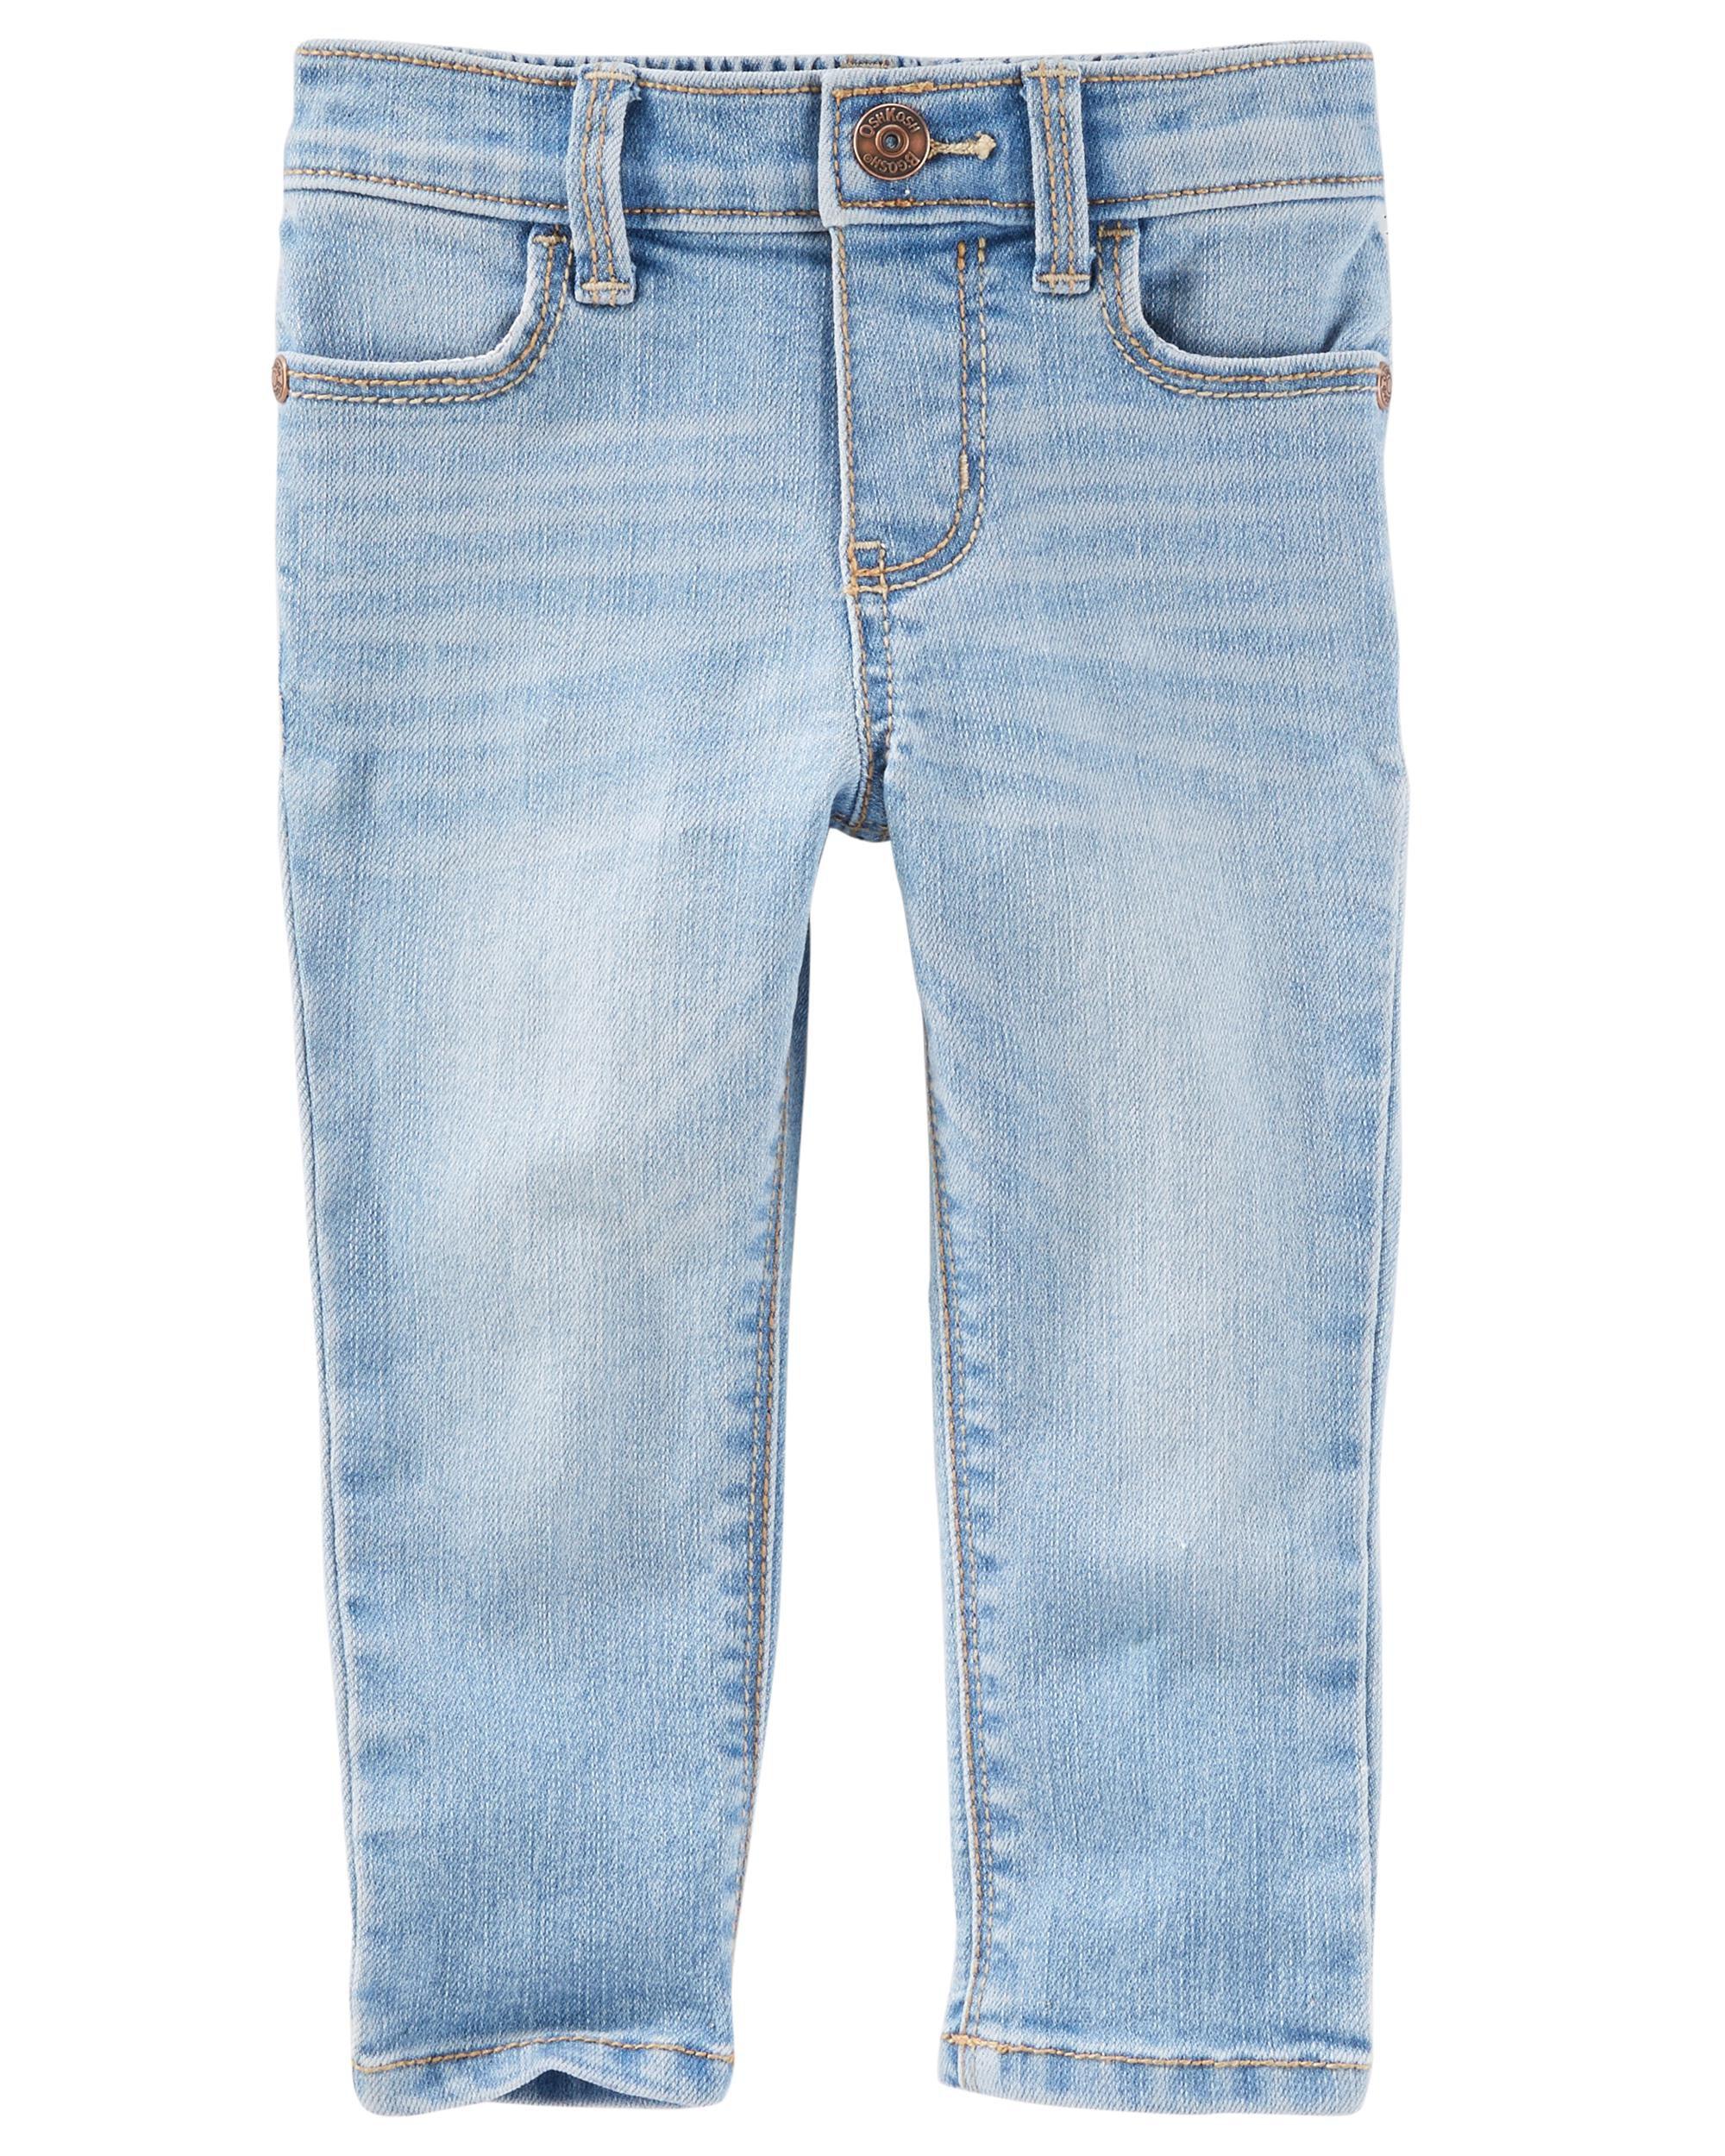 super skinny jeans winchester wash oshkosh com jeans 1083 jeans #4